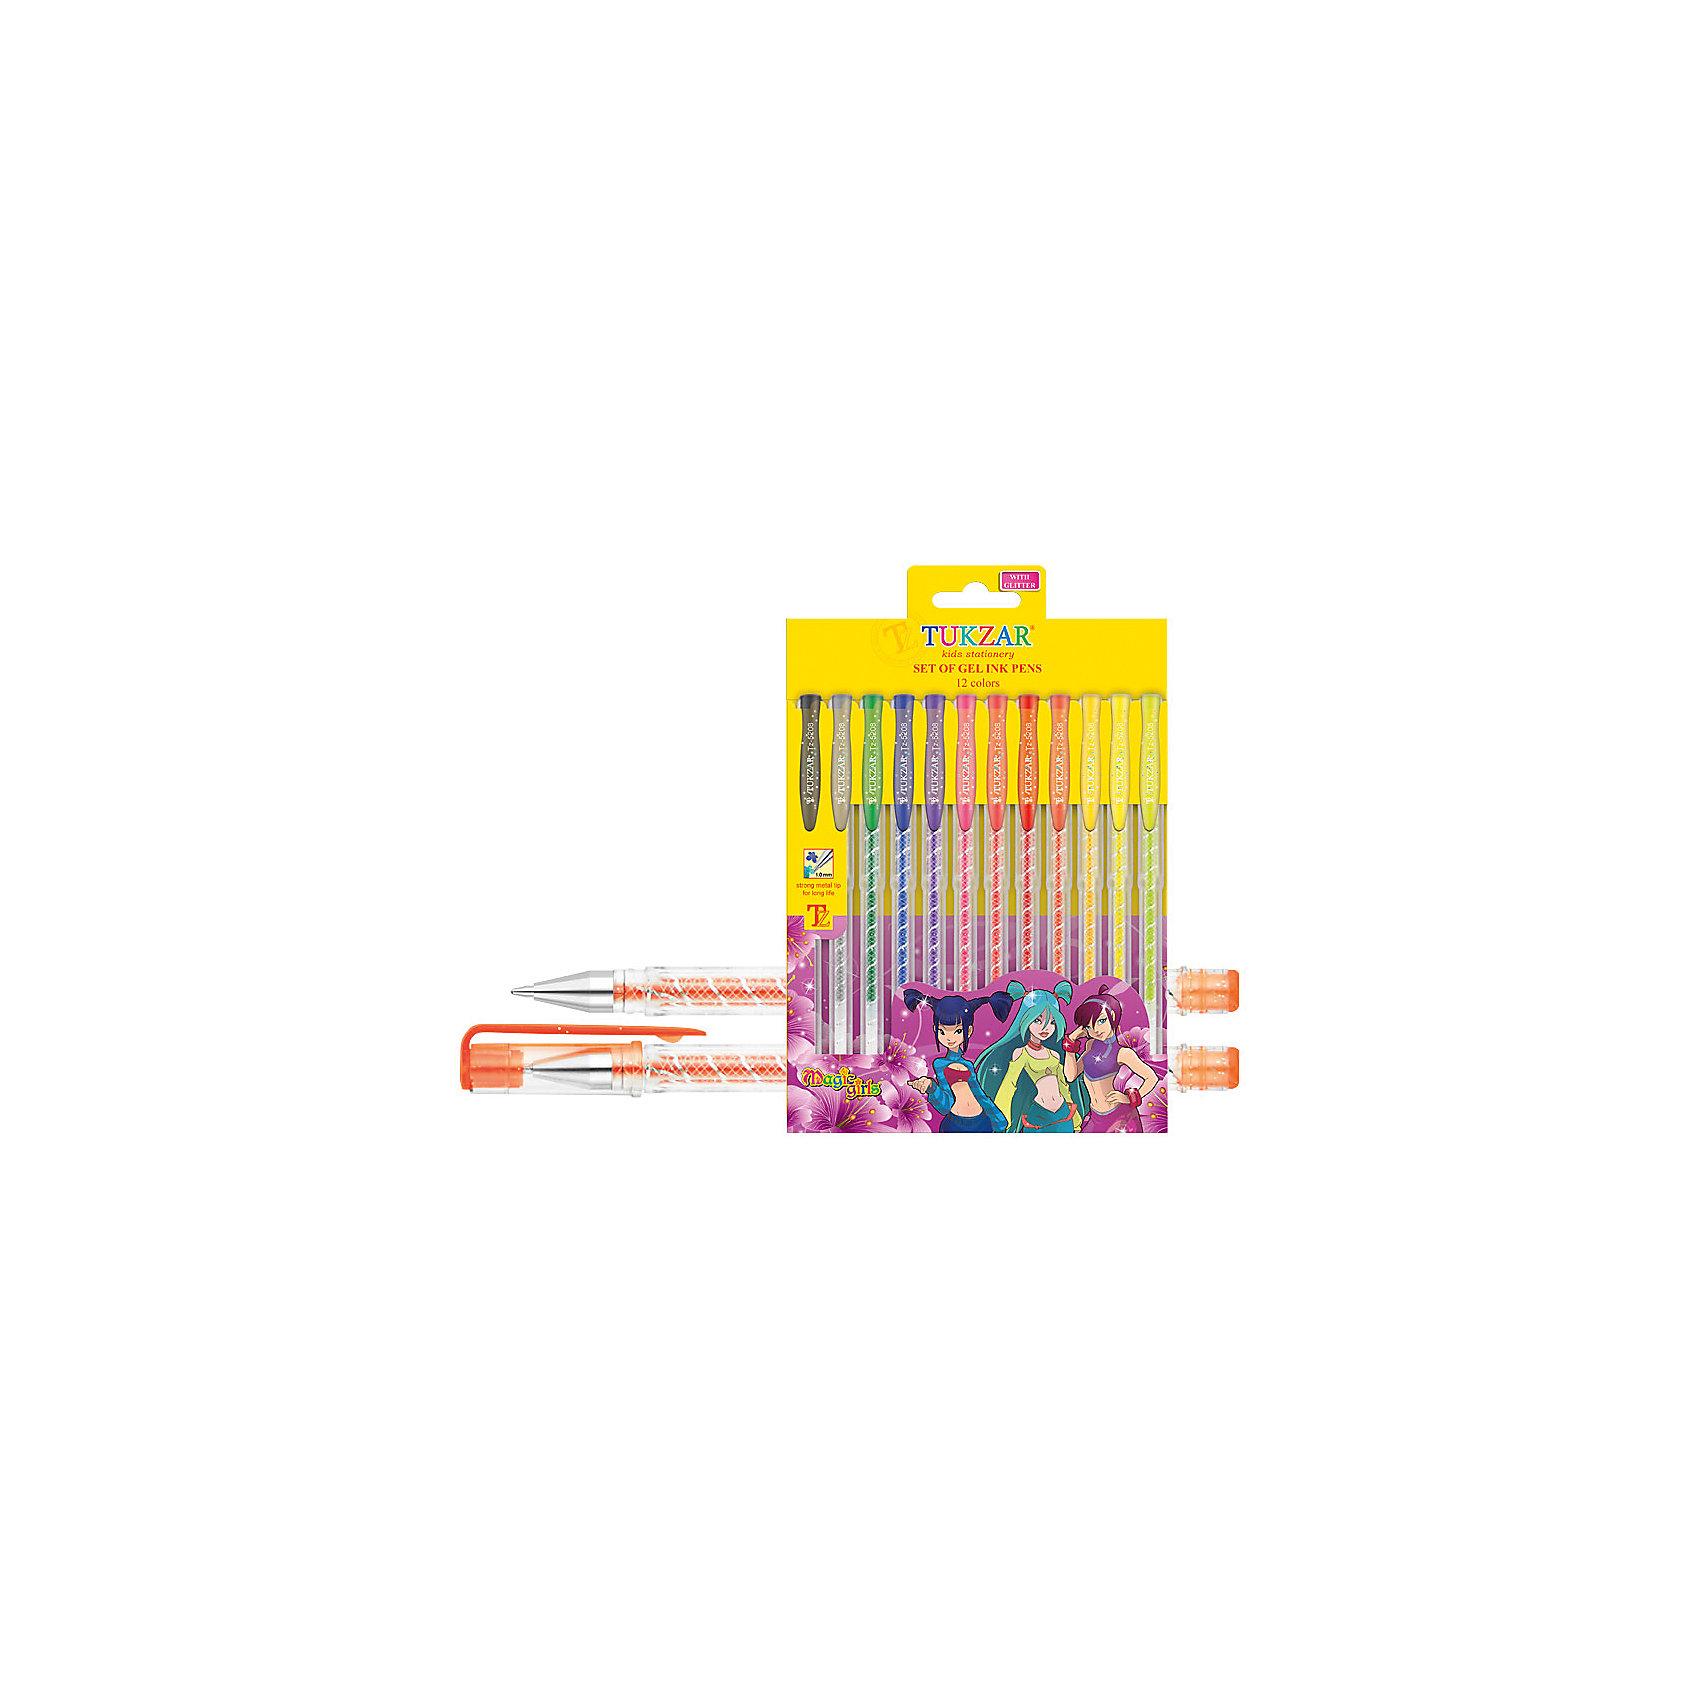 TUKZAR Набор гелевых ручек суперметаллик, 12 цв. hao yue style набор гелевых ручек 4 цвета